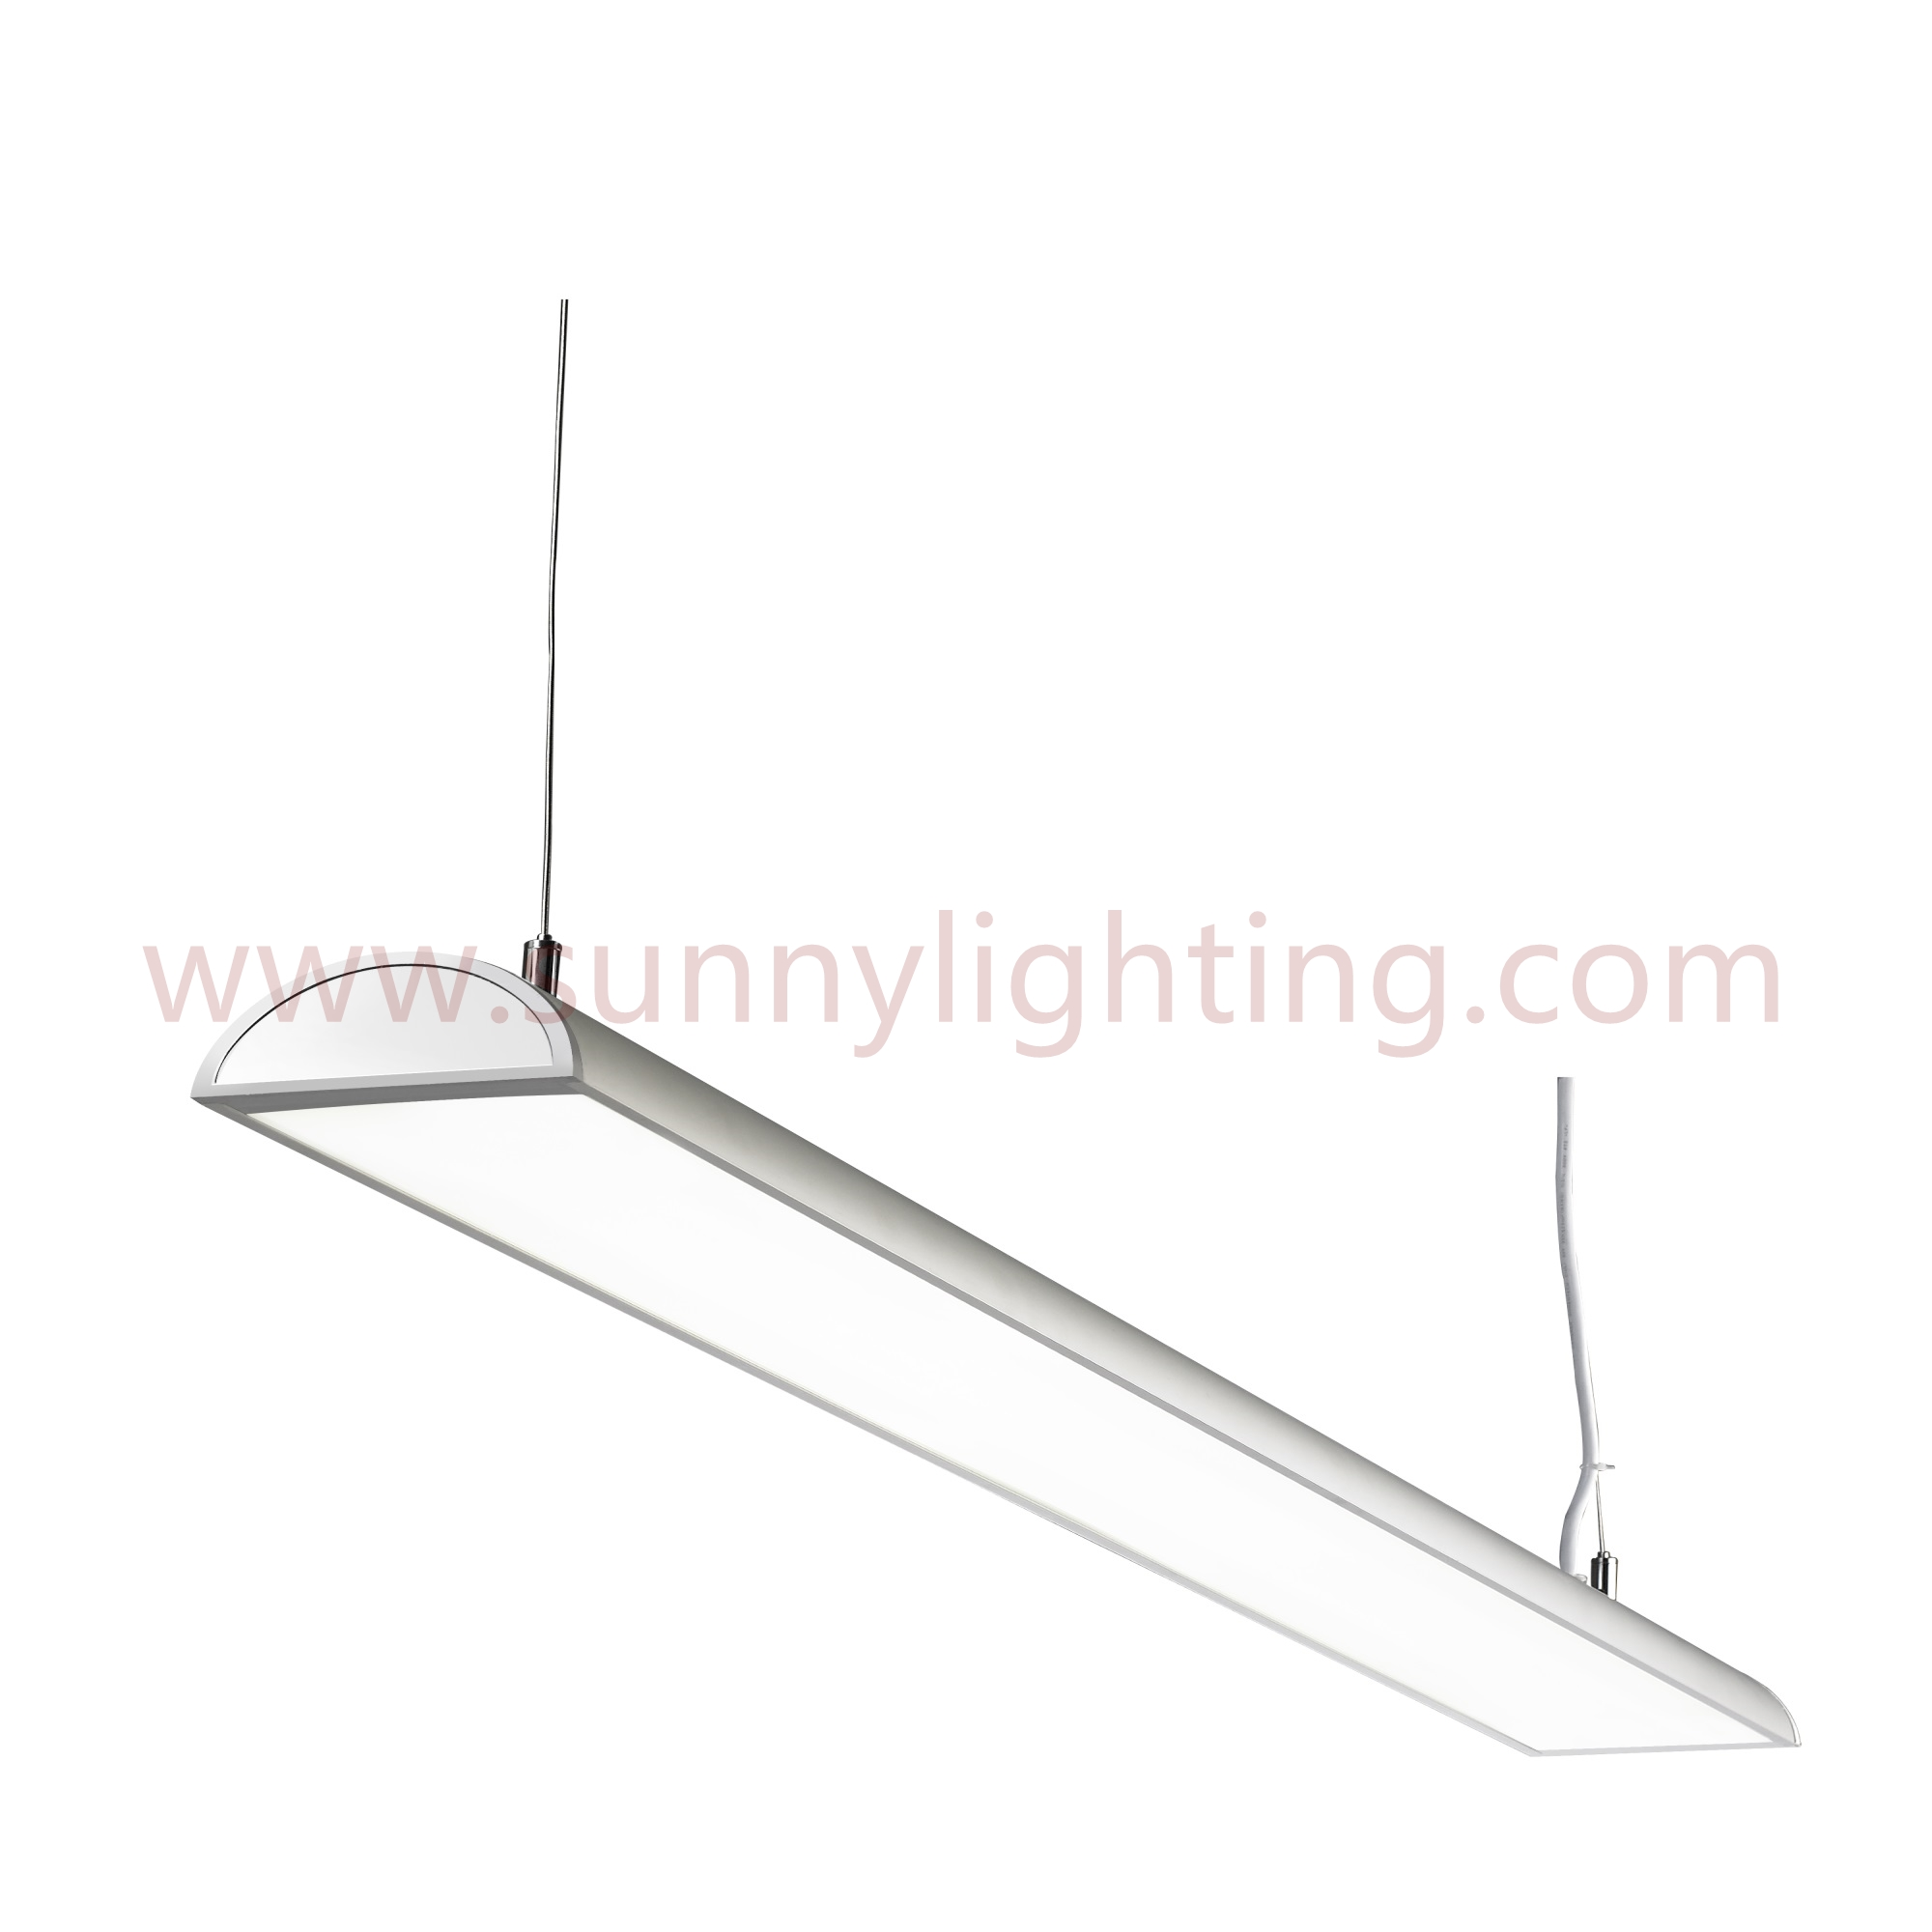 LED Linear Light 21.6/32.4W/43.2W/54W LED-018